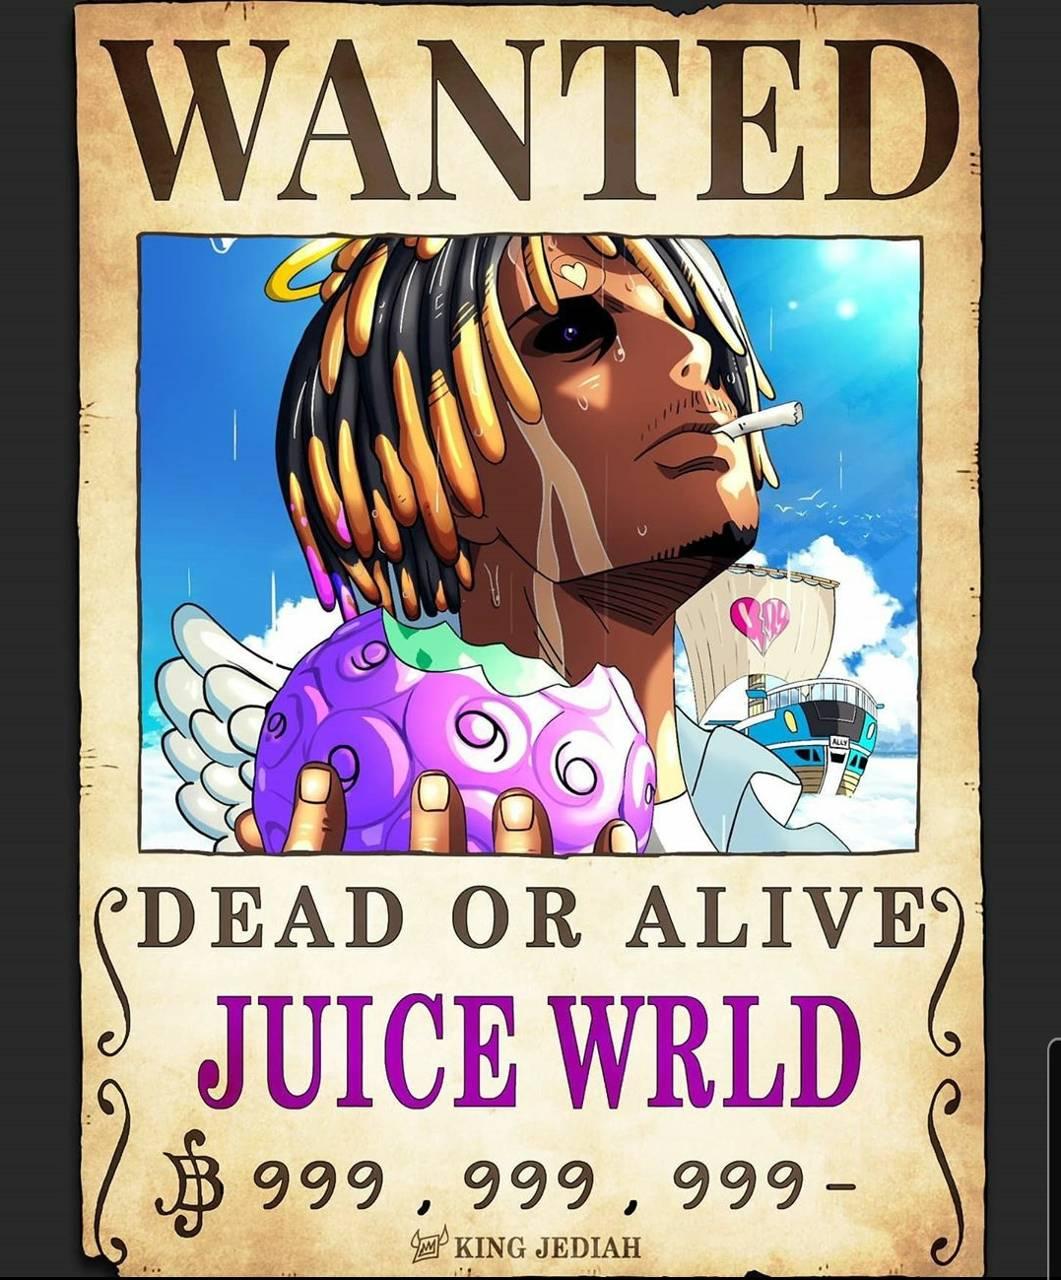 Juice Wrld 999 Wallpaper By Metheles17 89 Free On Zedge